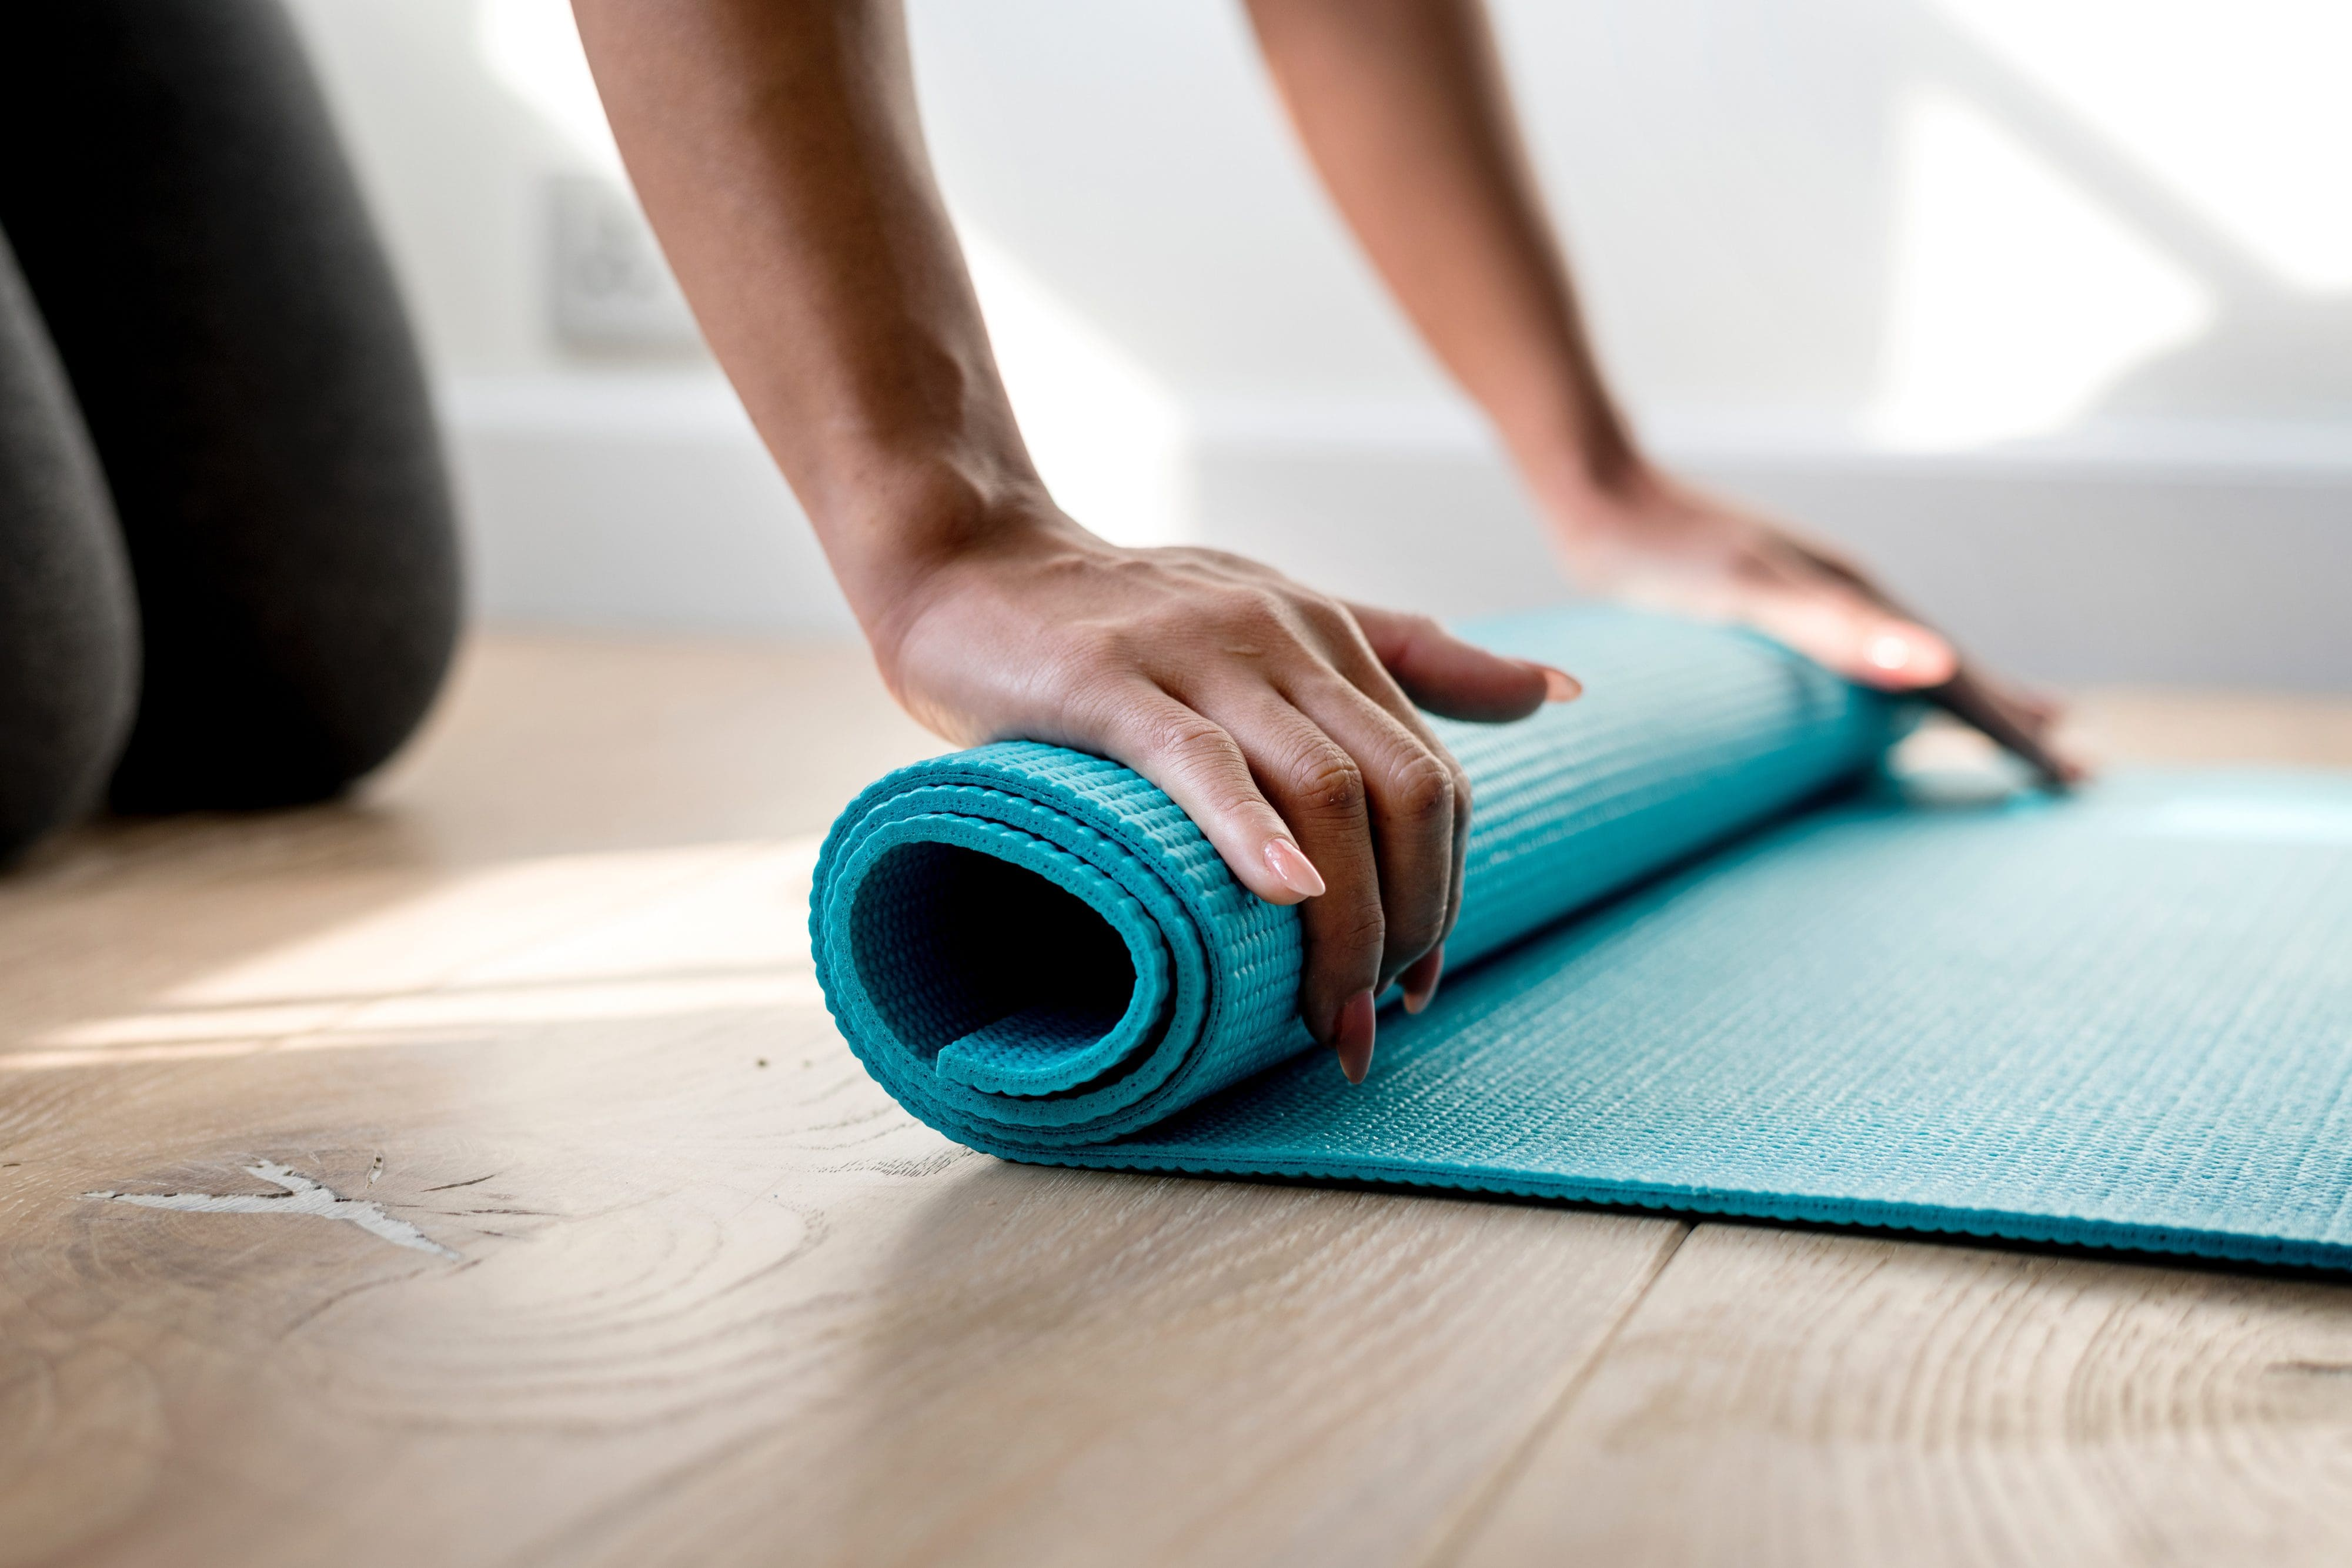 Person rolls up a yoga mat